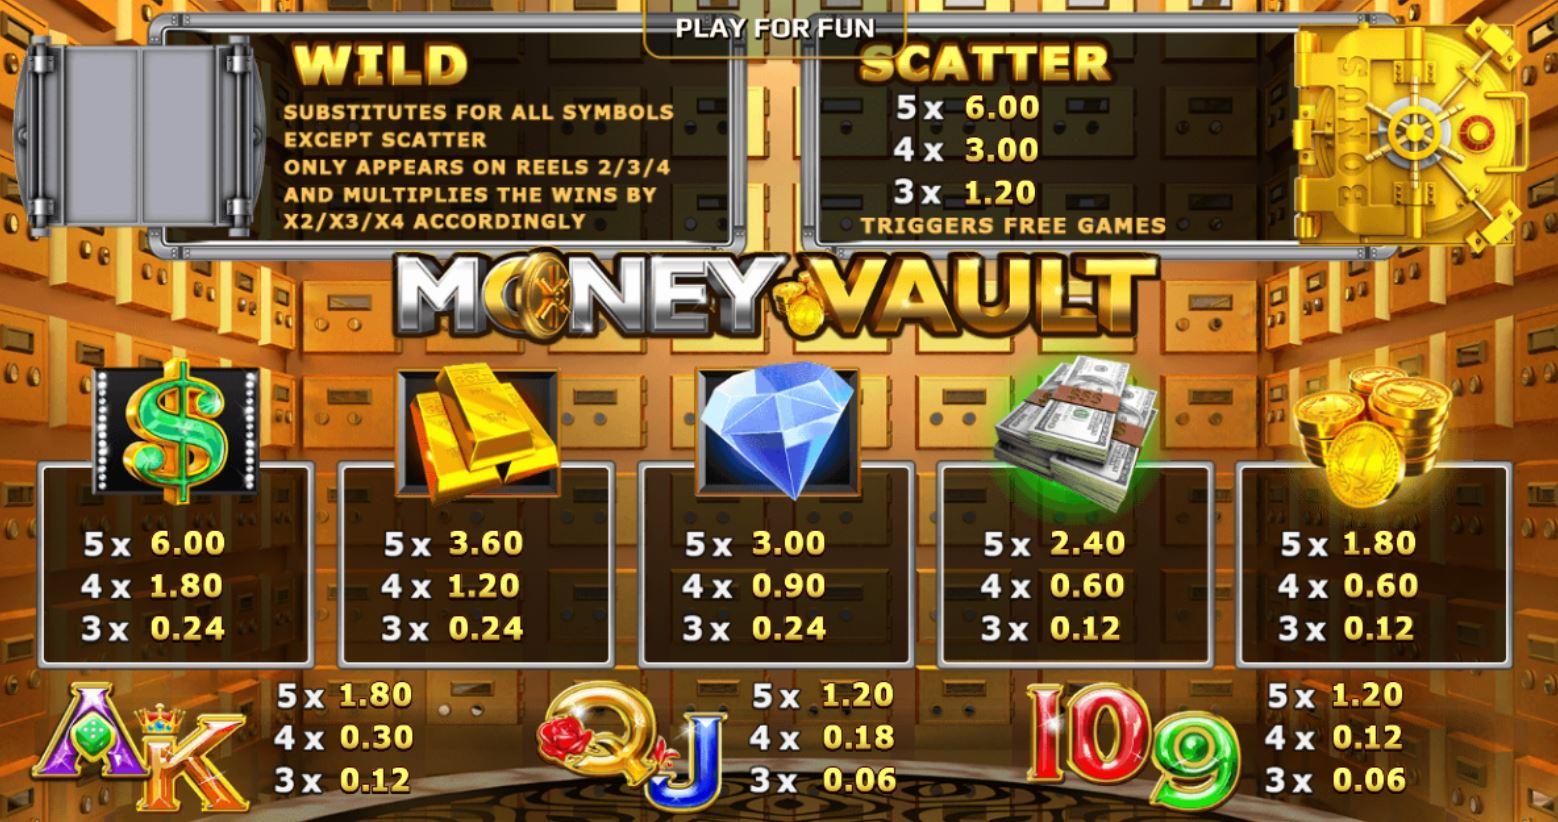 Money Vault รีวิวเกมสล็อต กับ ภารกิจปล้นเงิน-3